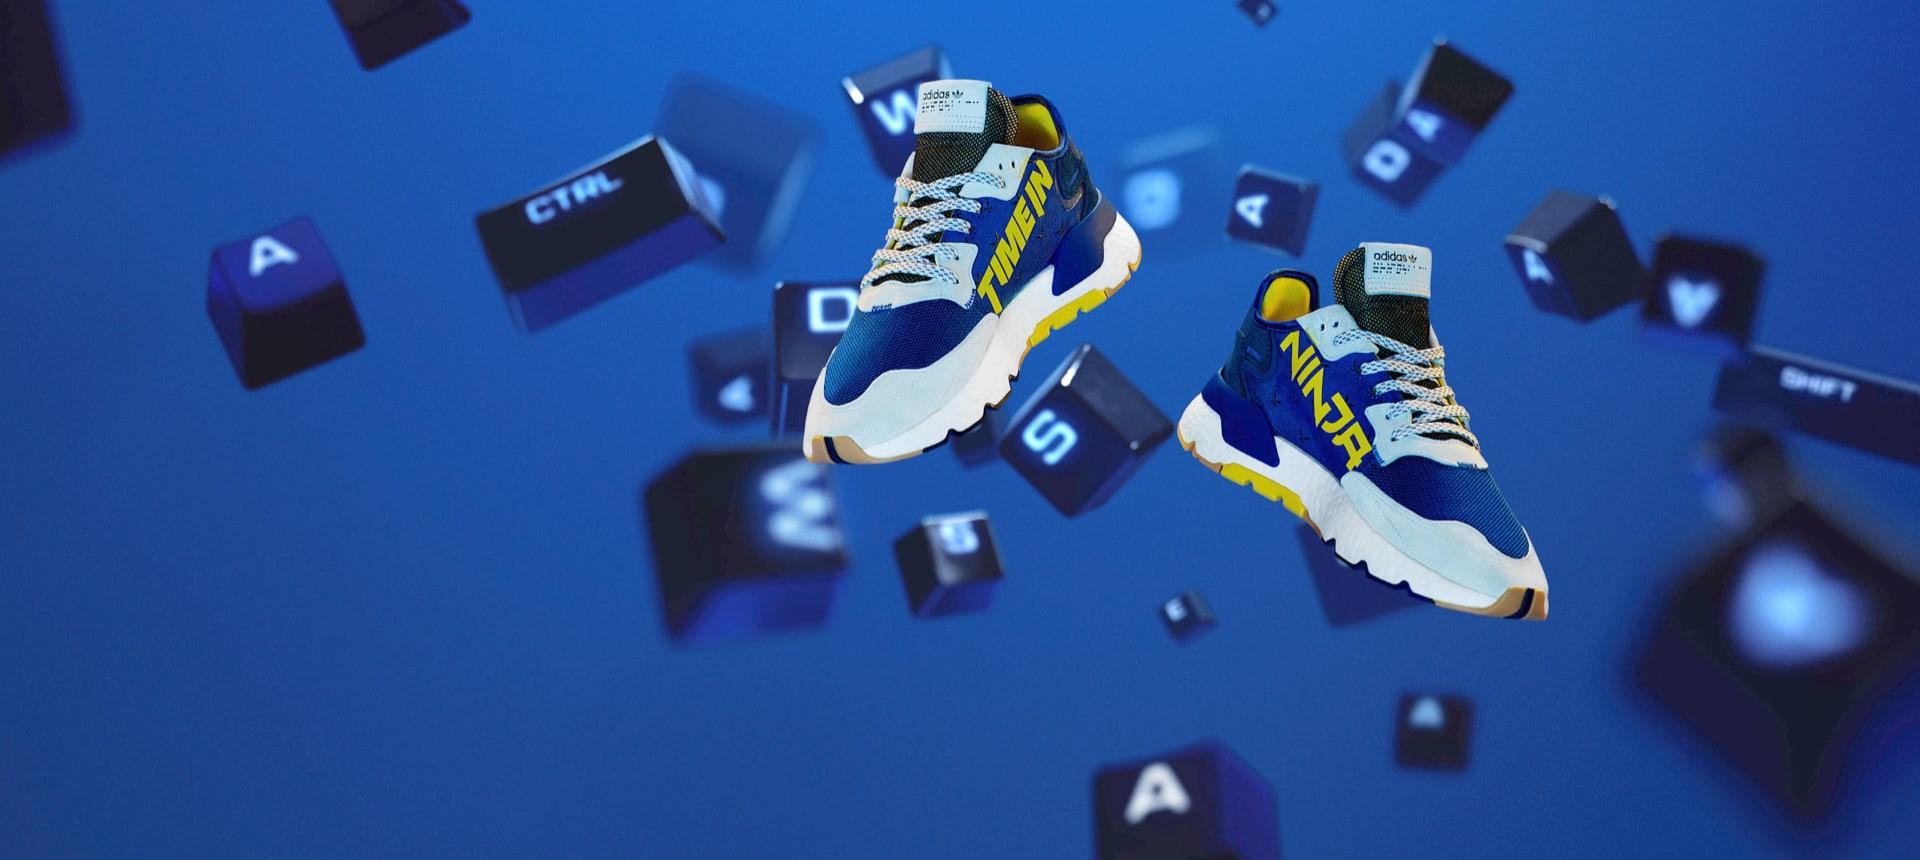 zapatos adidas olx guatemala 6000